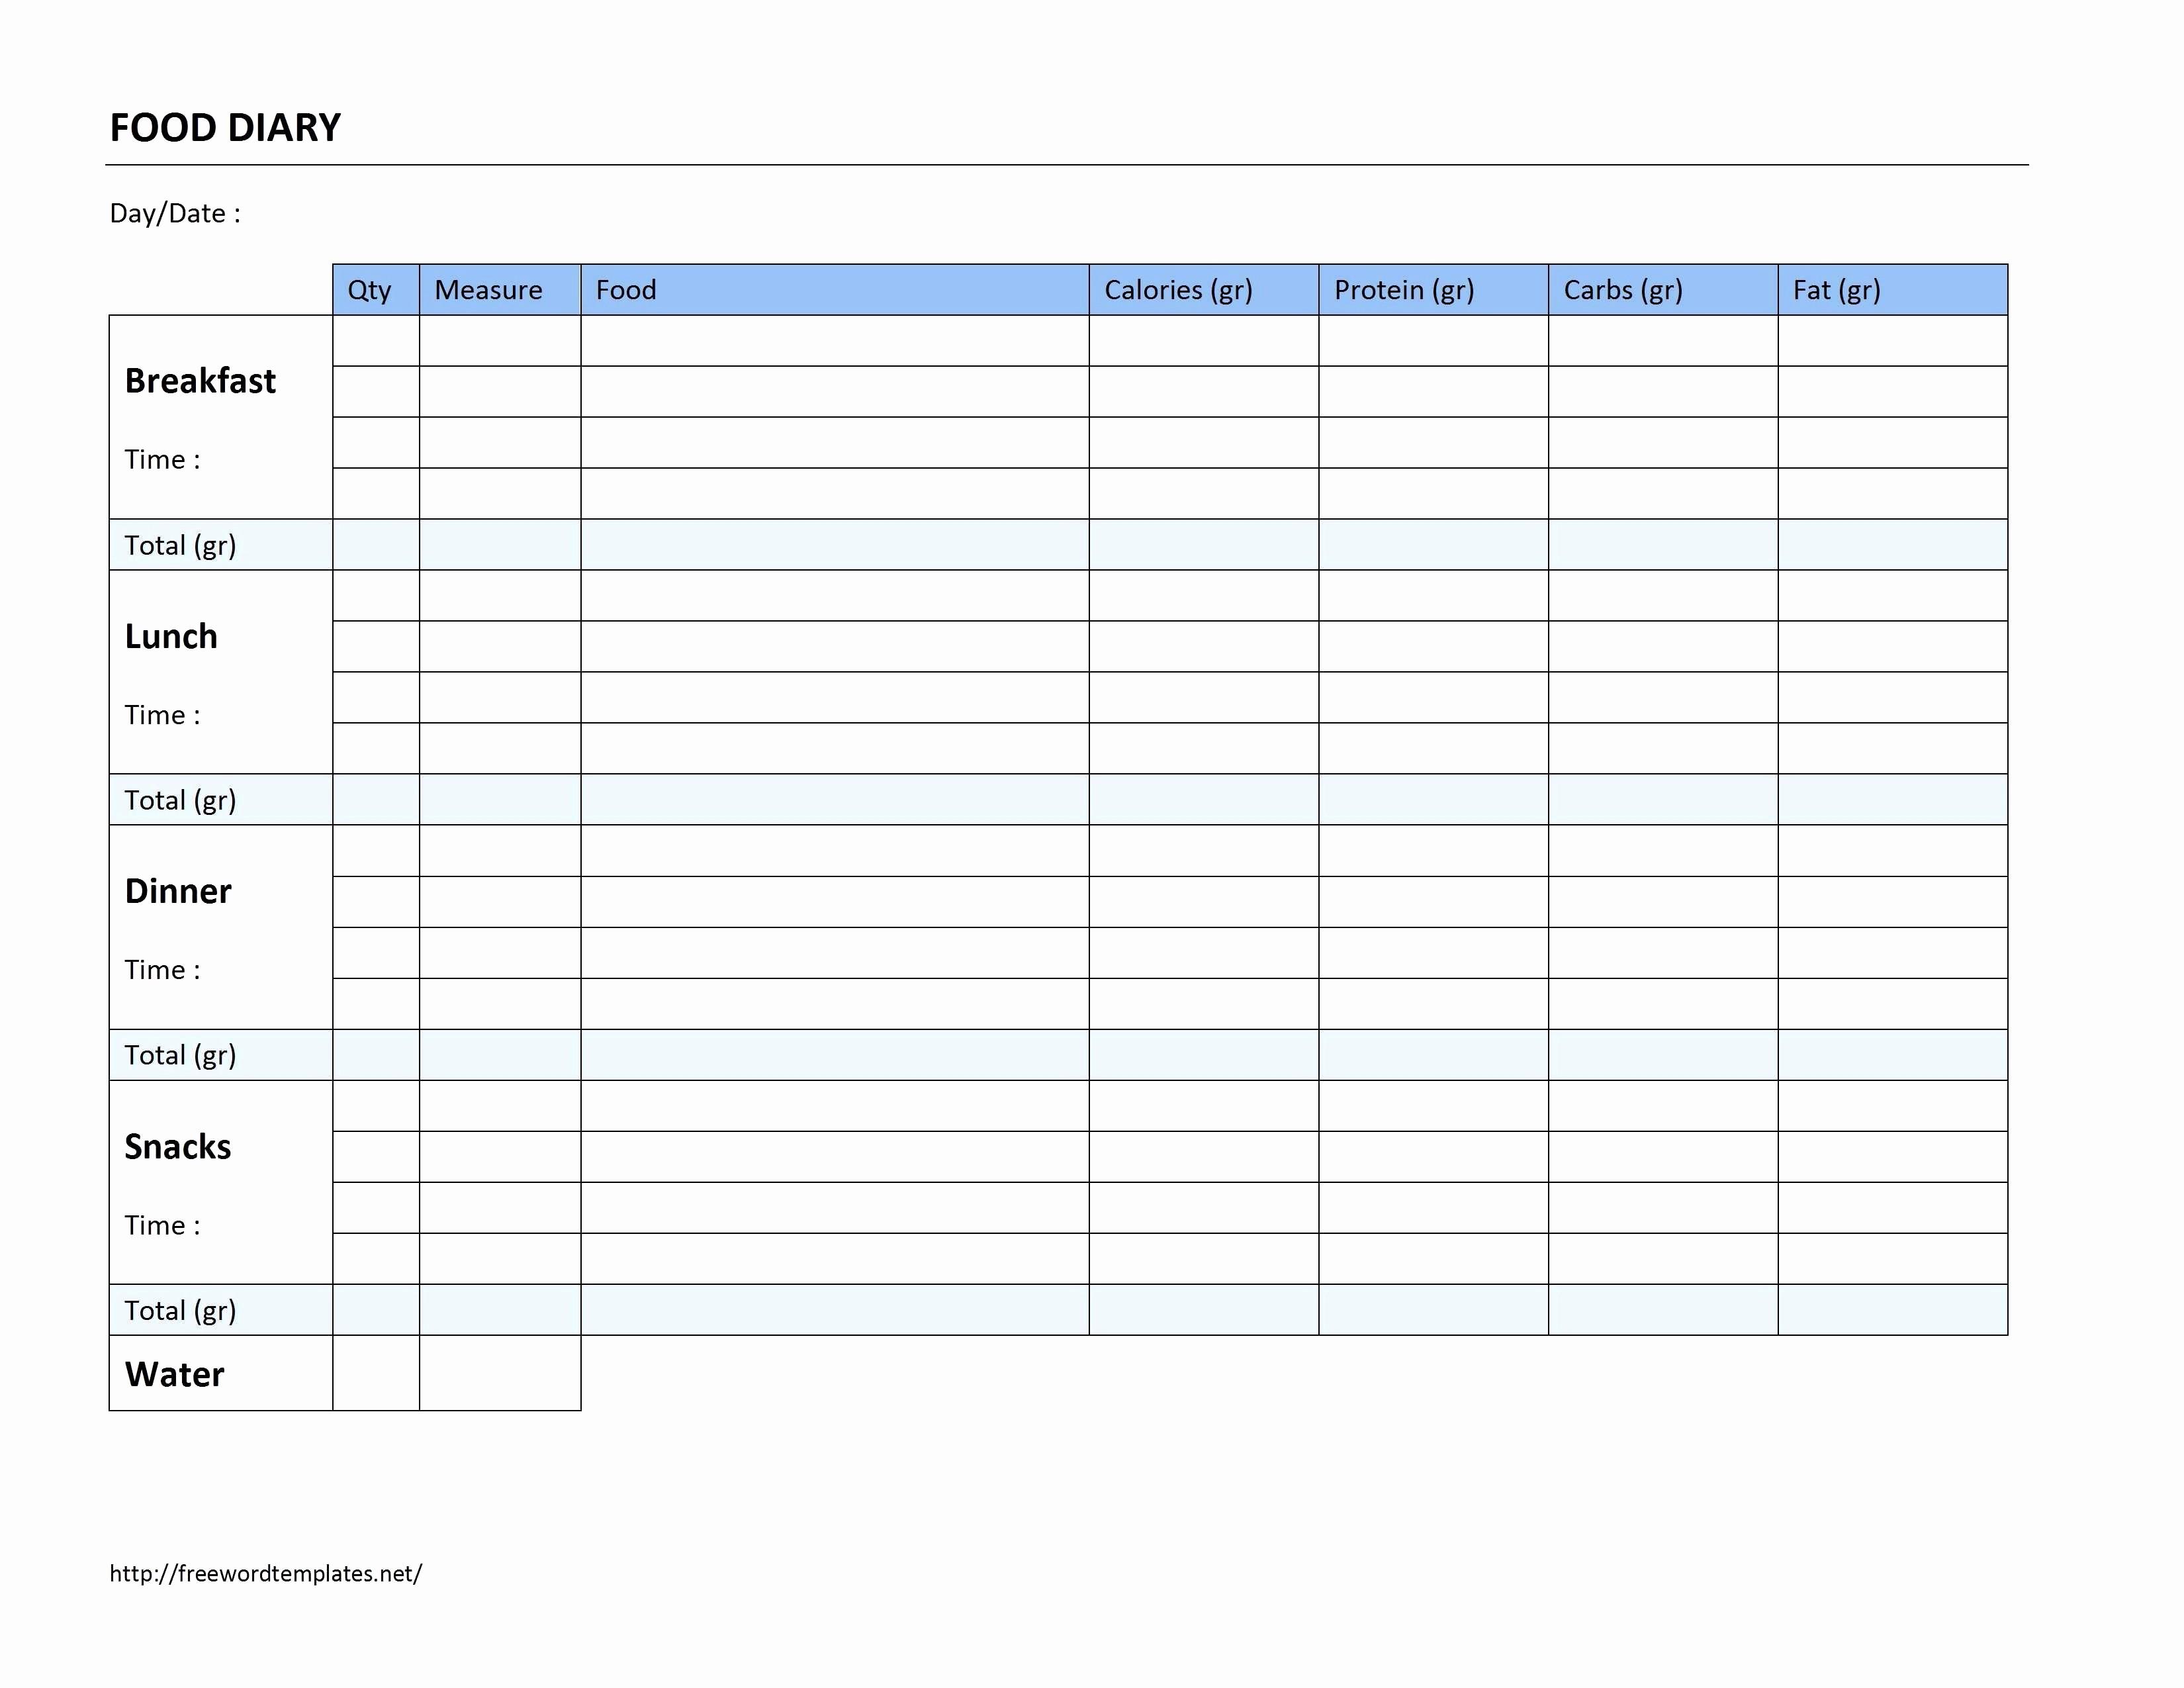 Weight Loss Tracker Excel Spreadsheet Fresh Free Weight Loss Tracker Spreadsheet